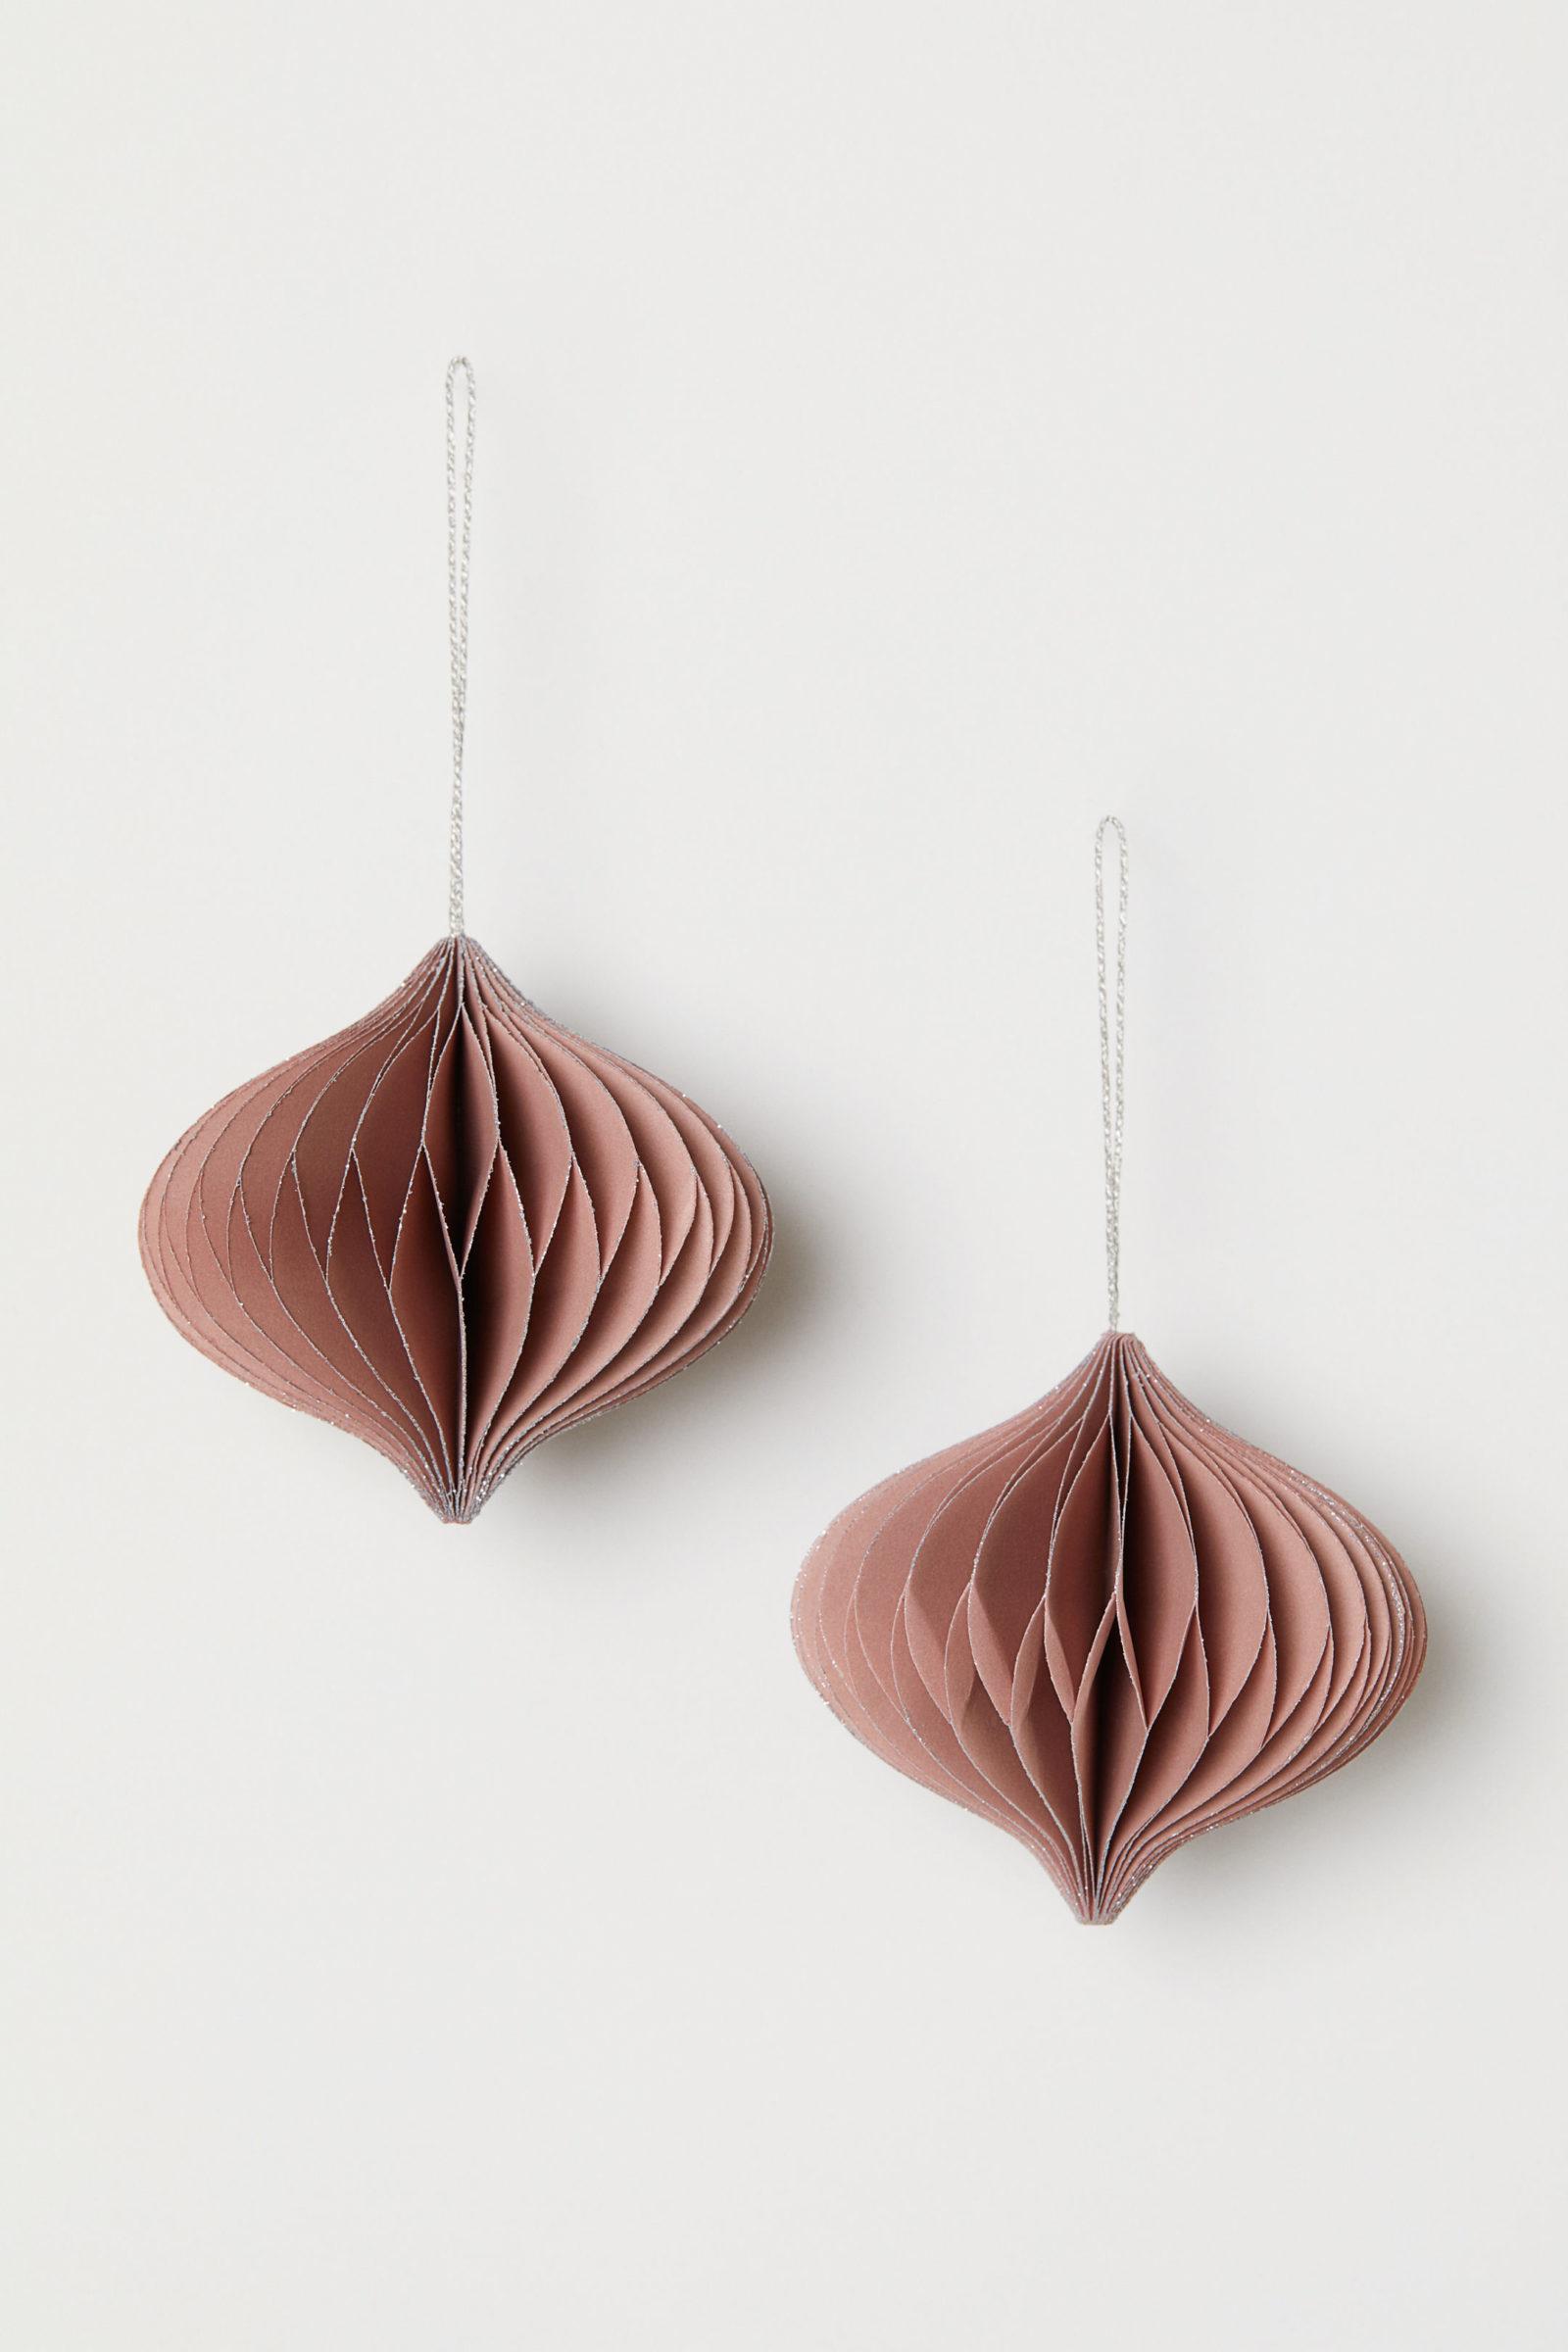 H&M Paper ornament